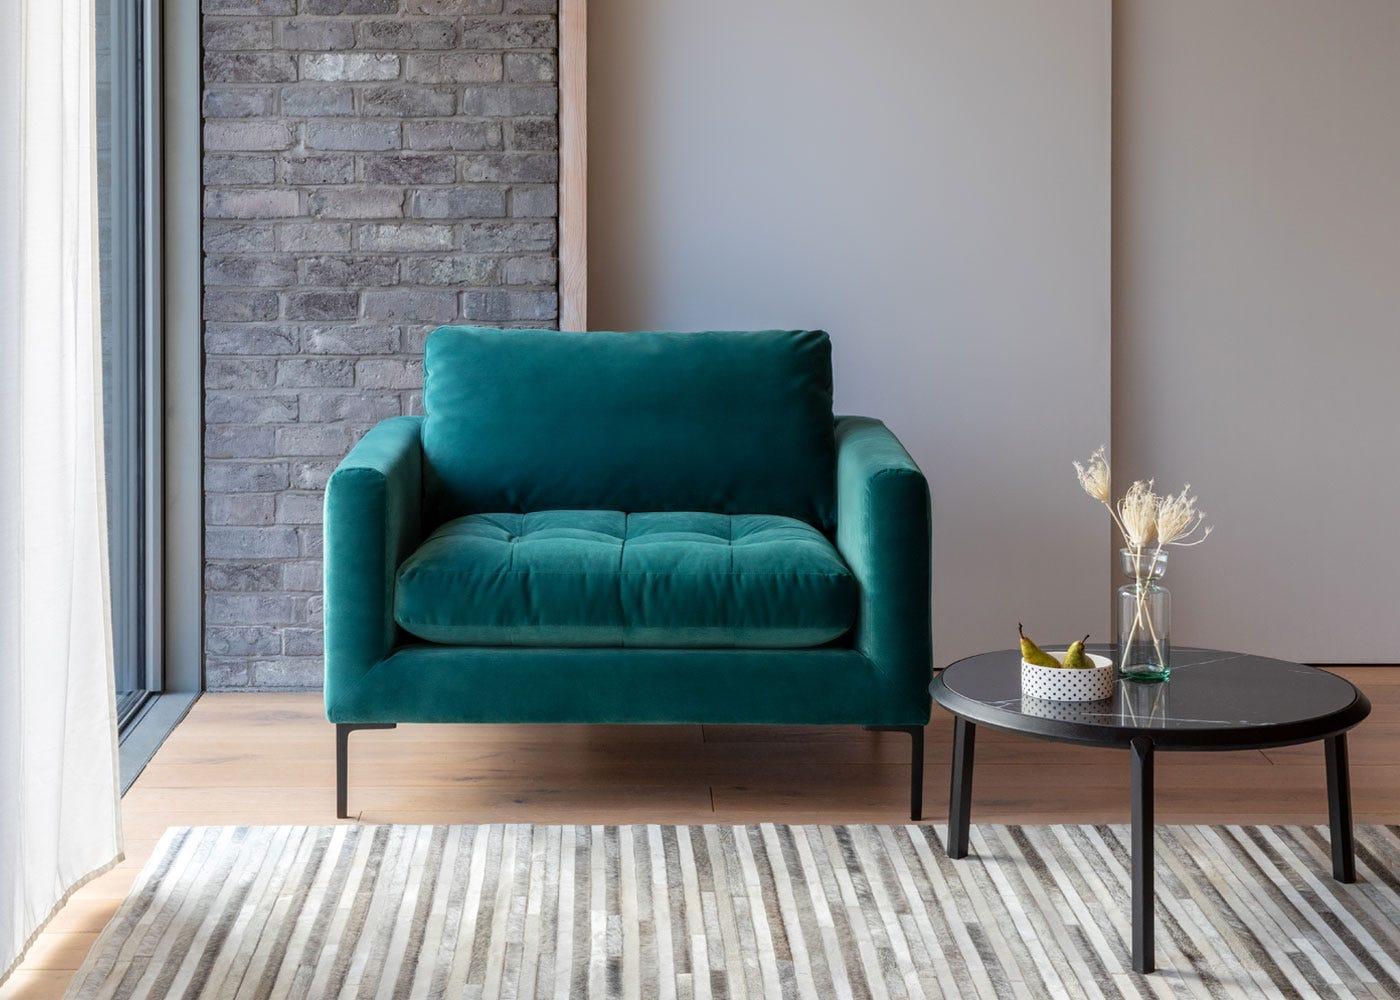 Eton love seat, Notch coffee table.